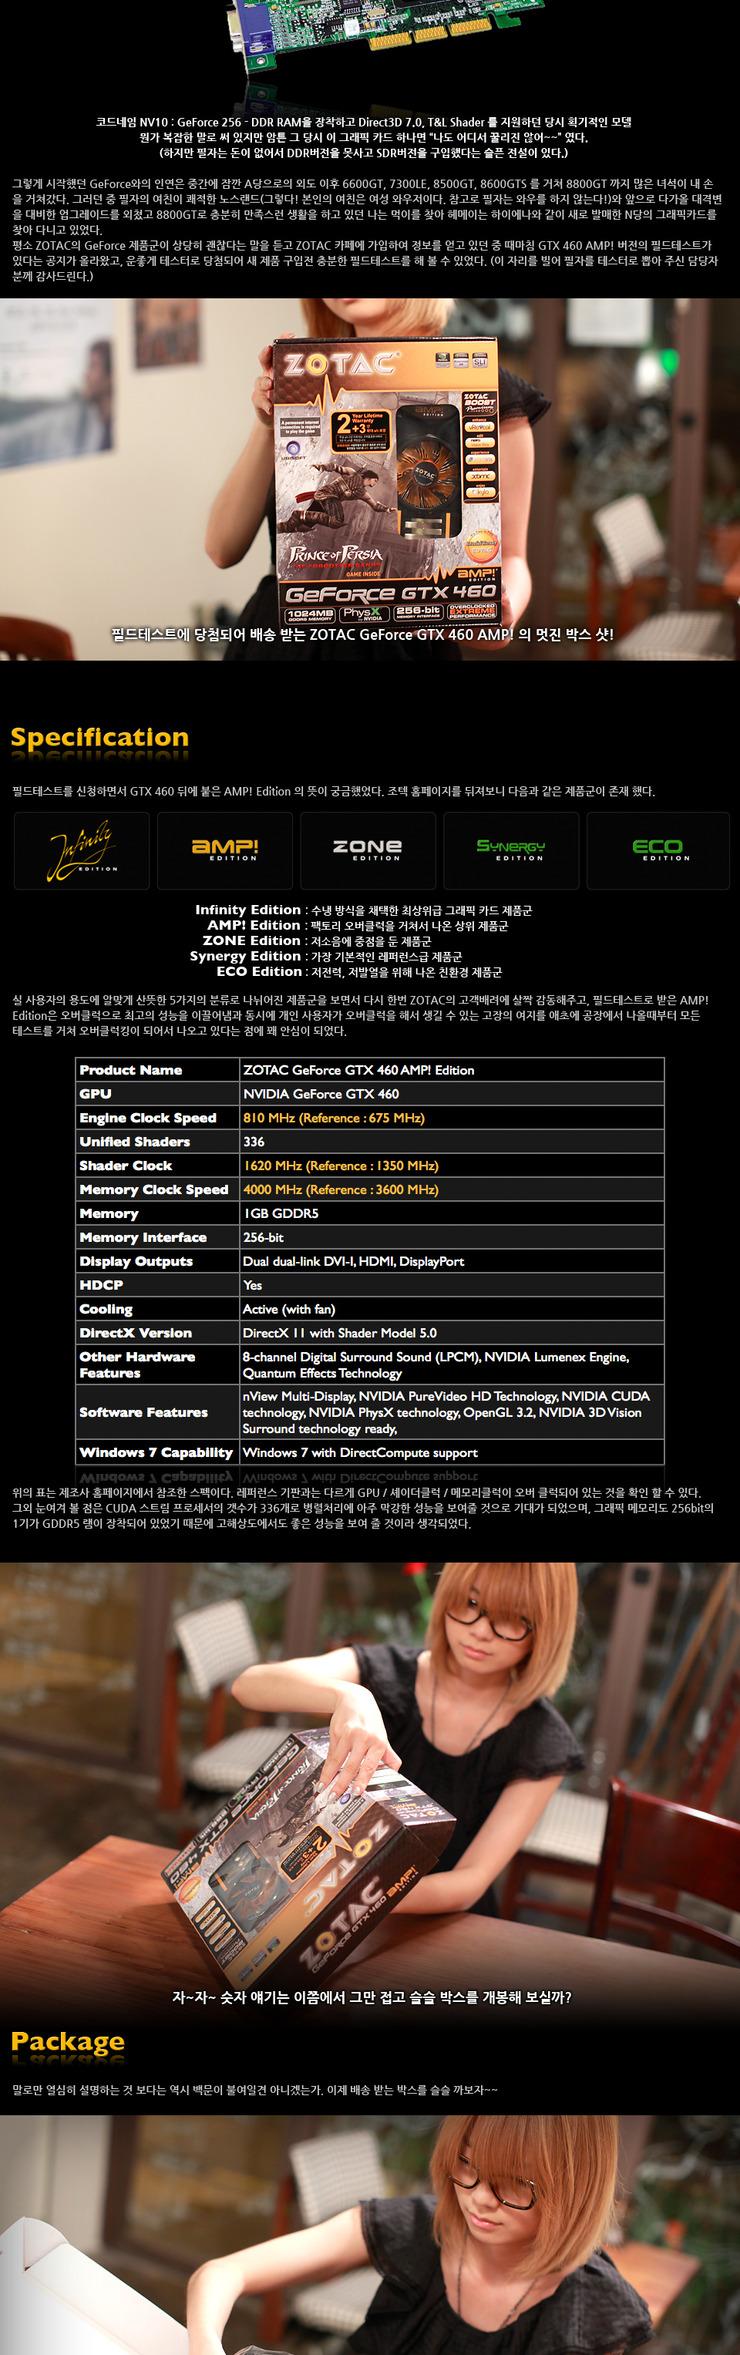 ZOTAC GTX460 AMP! EDITION